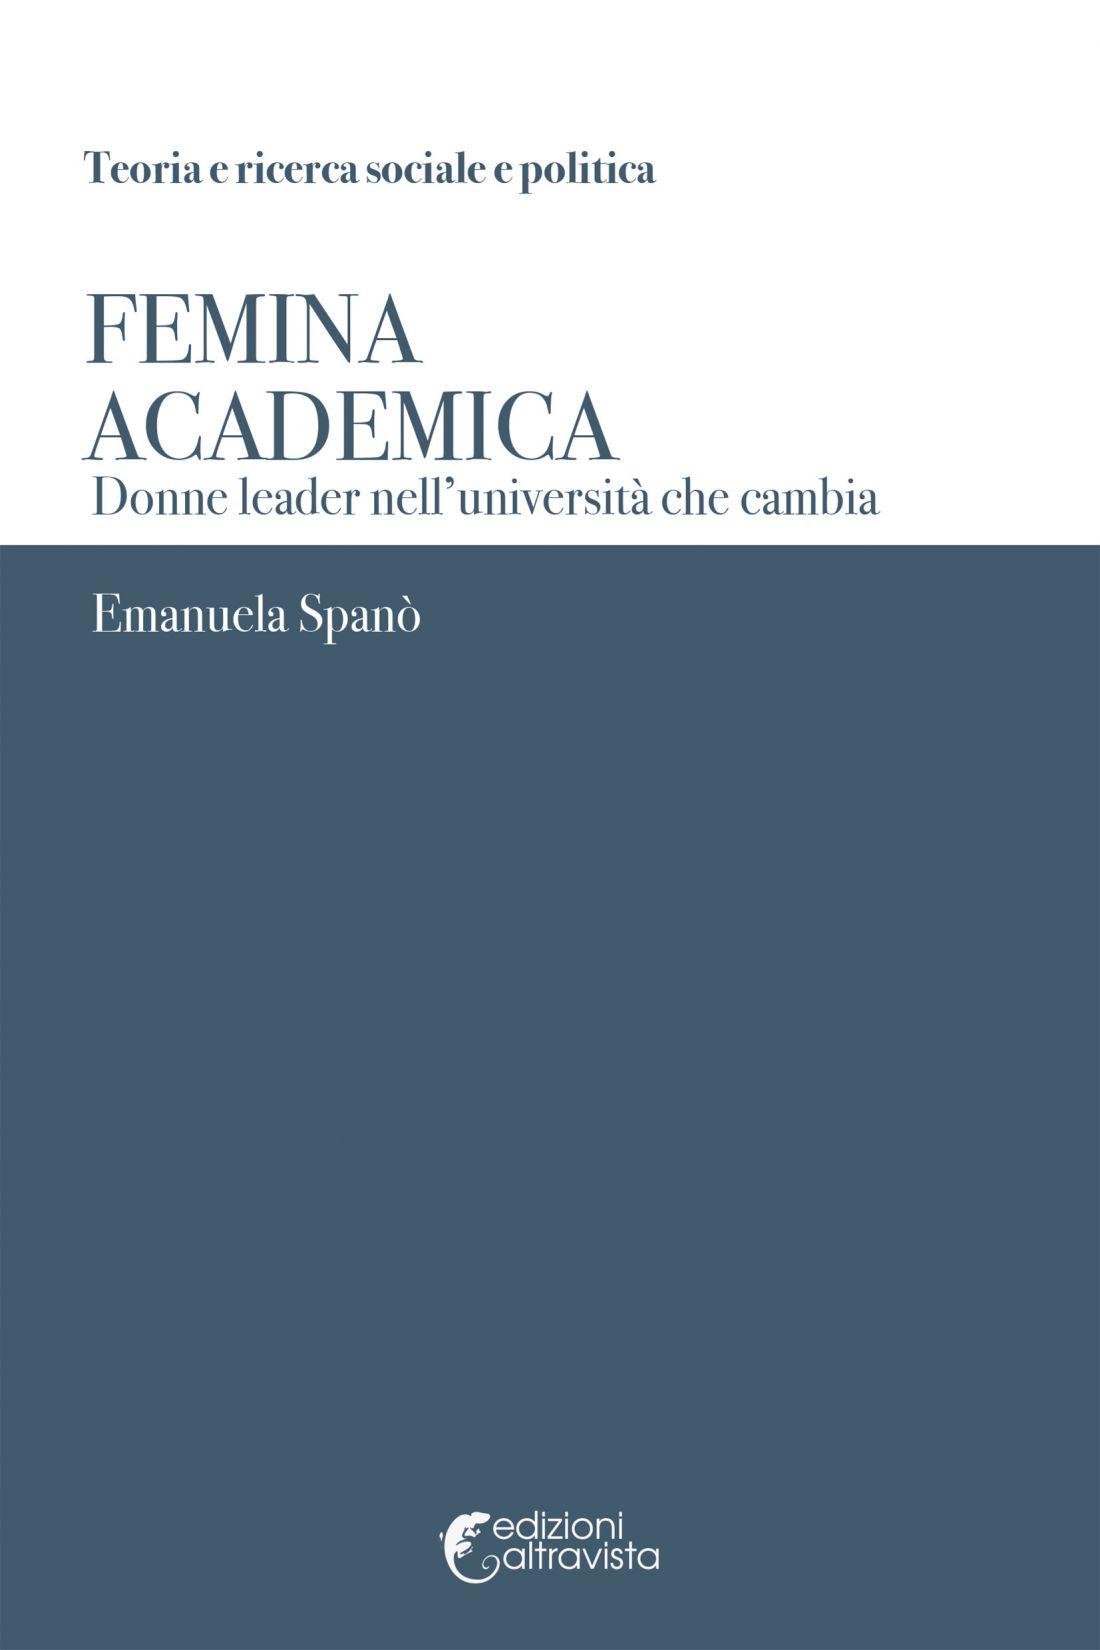 Femina Academica